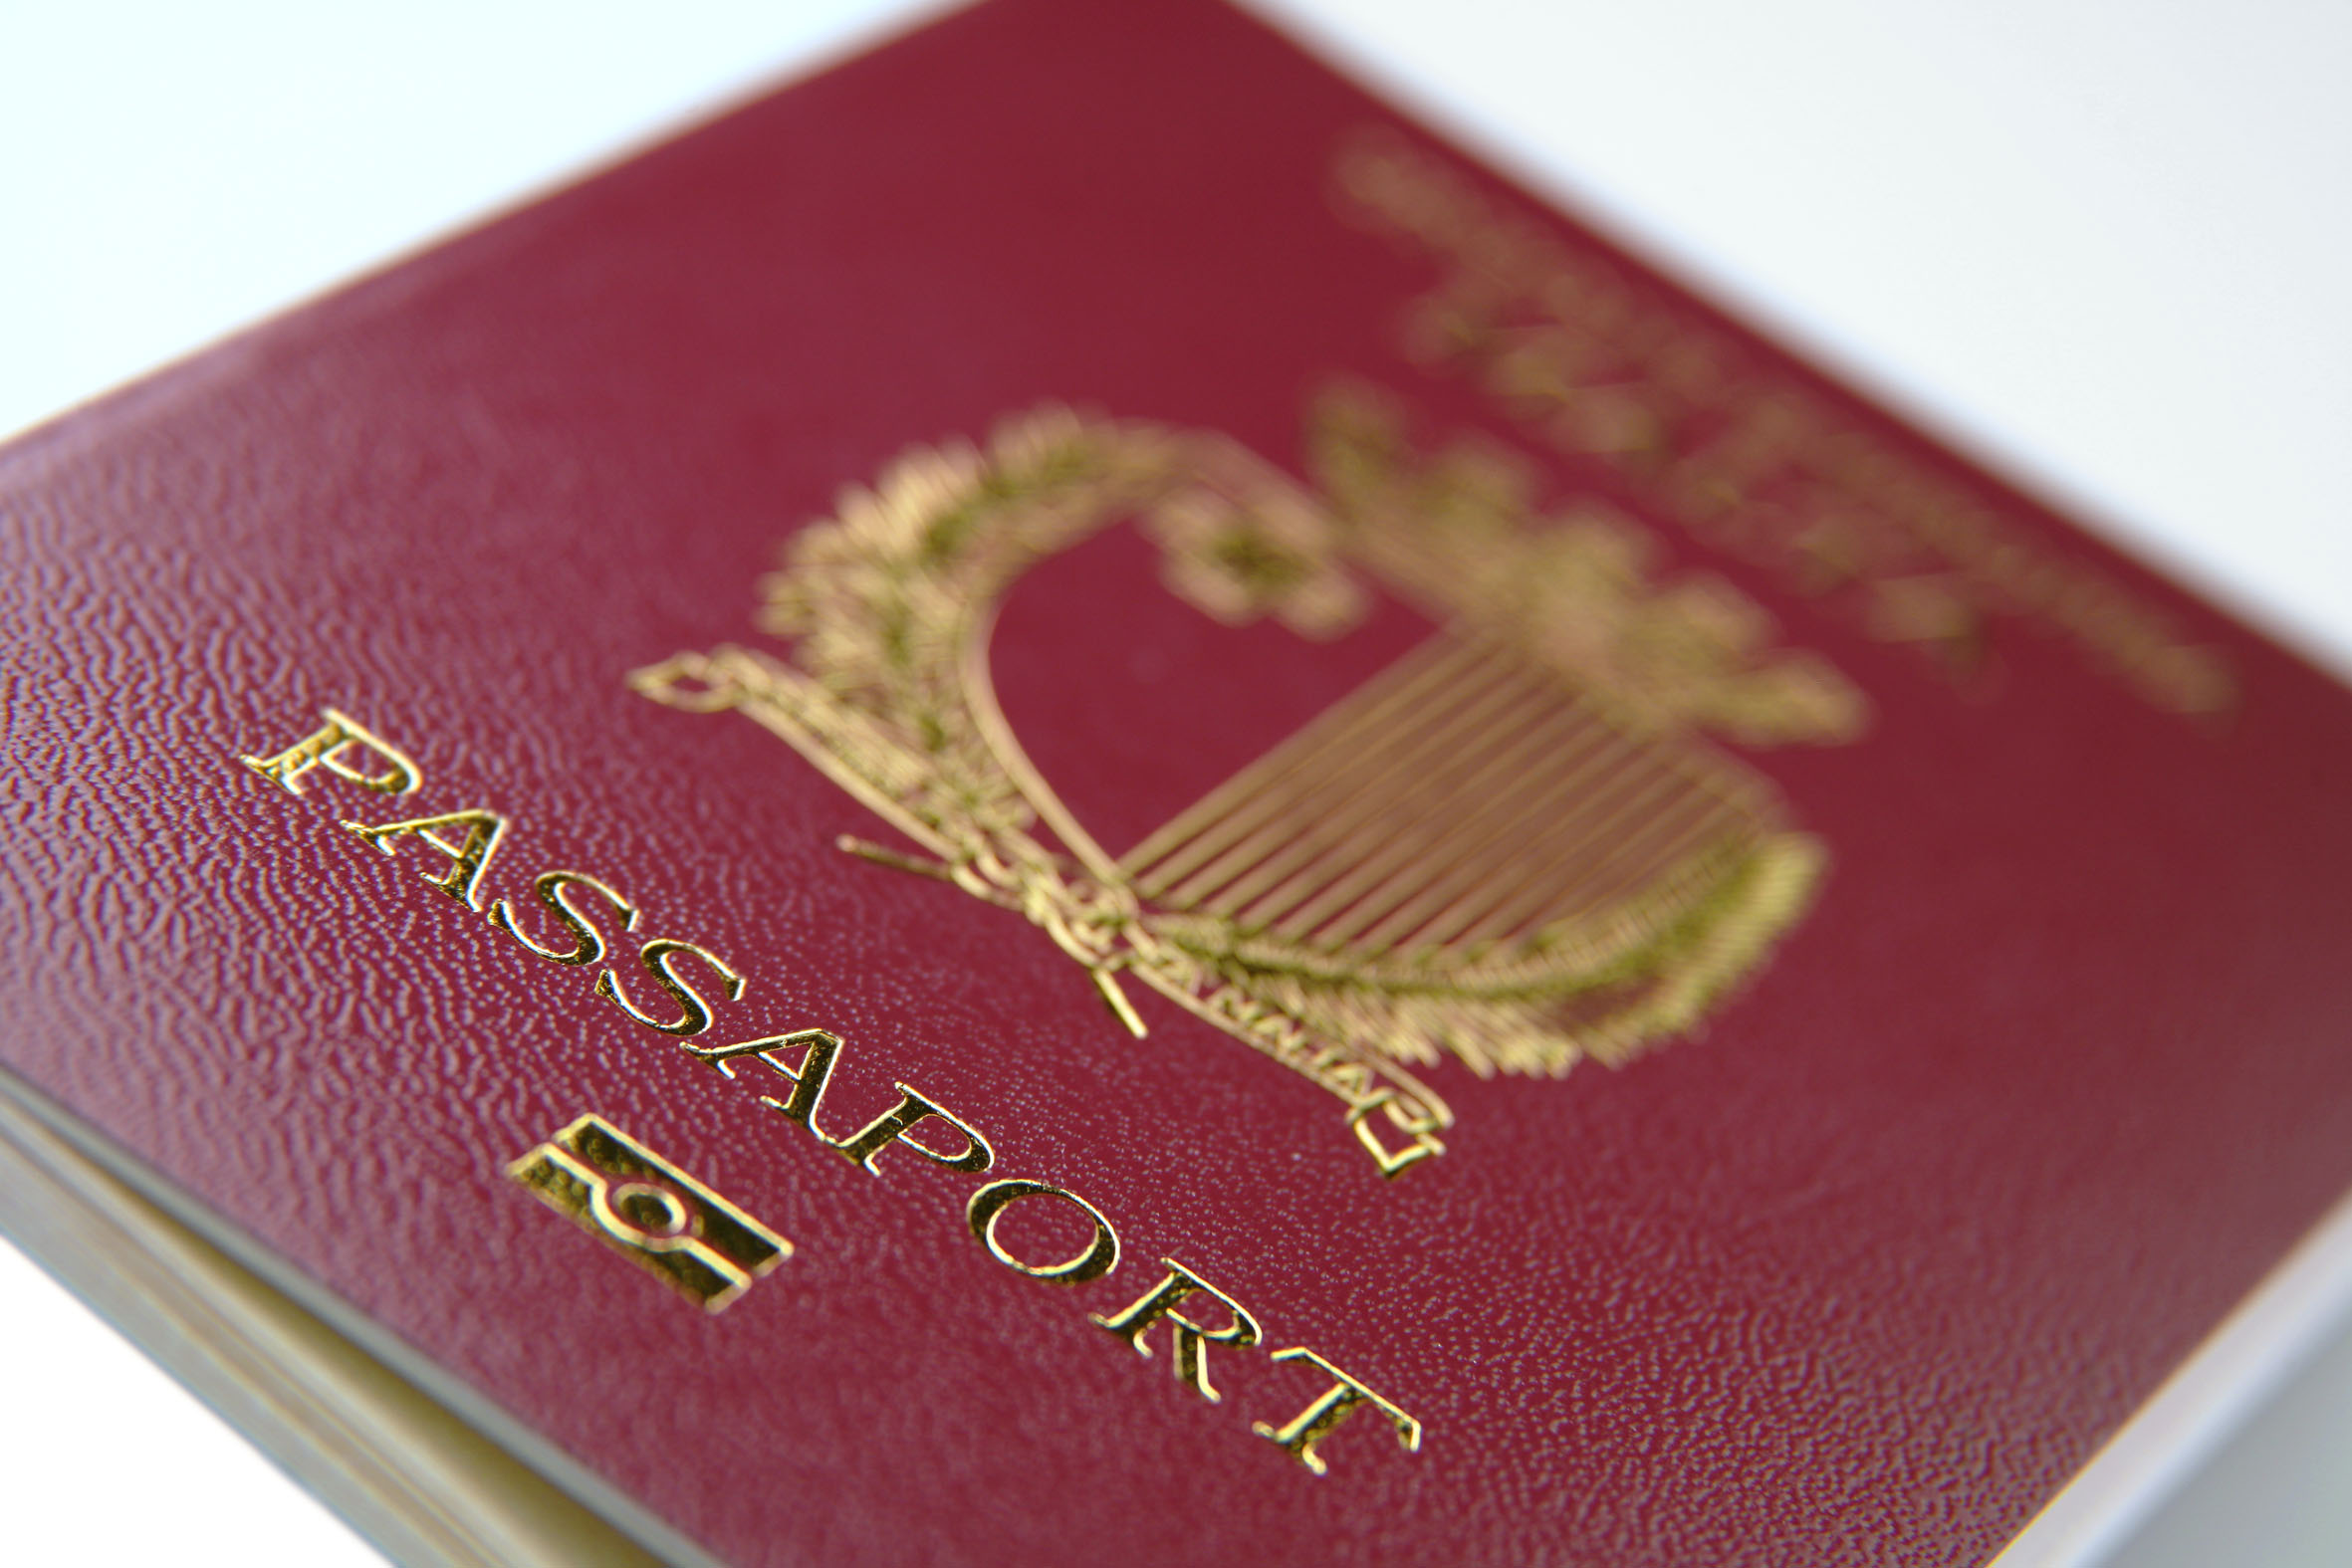 Malta-passport-(2010)-cover-3.jpg